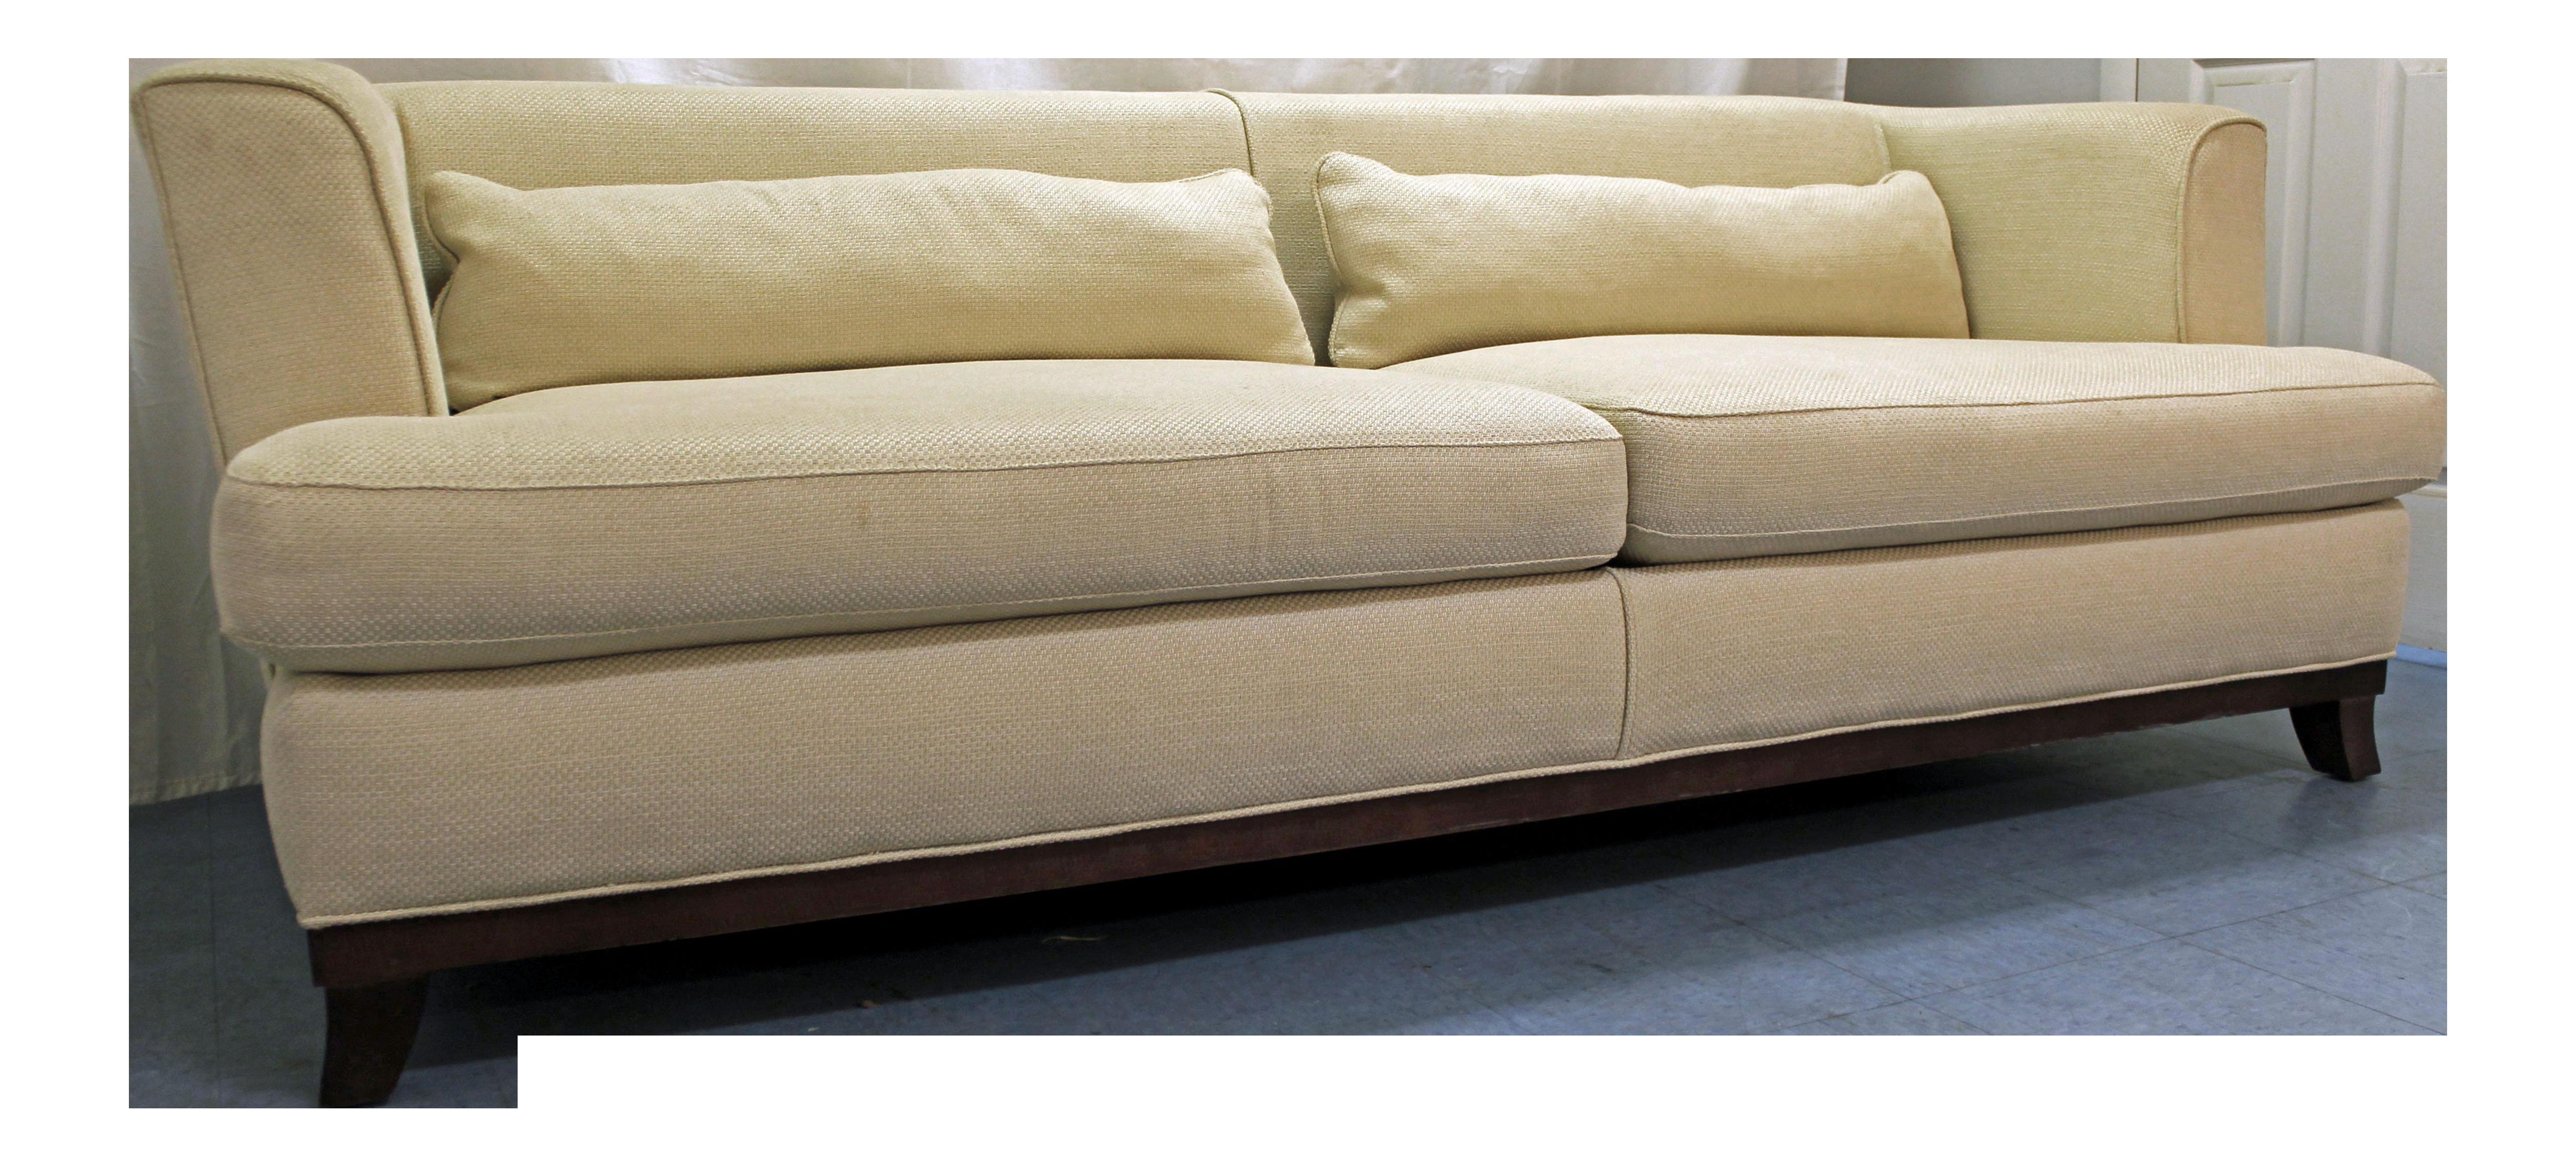 Milo Baughman For Thayer Coggin White Sofa Chairish